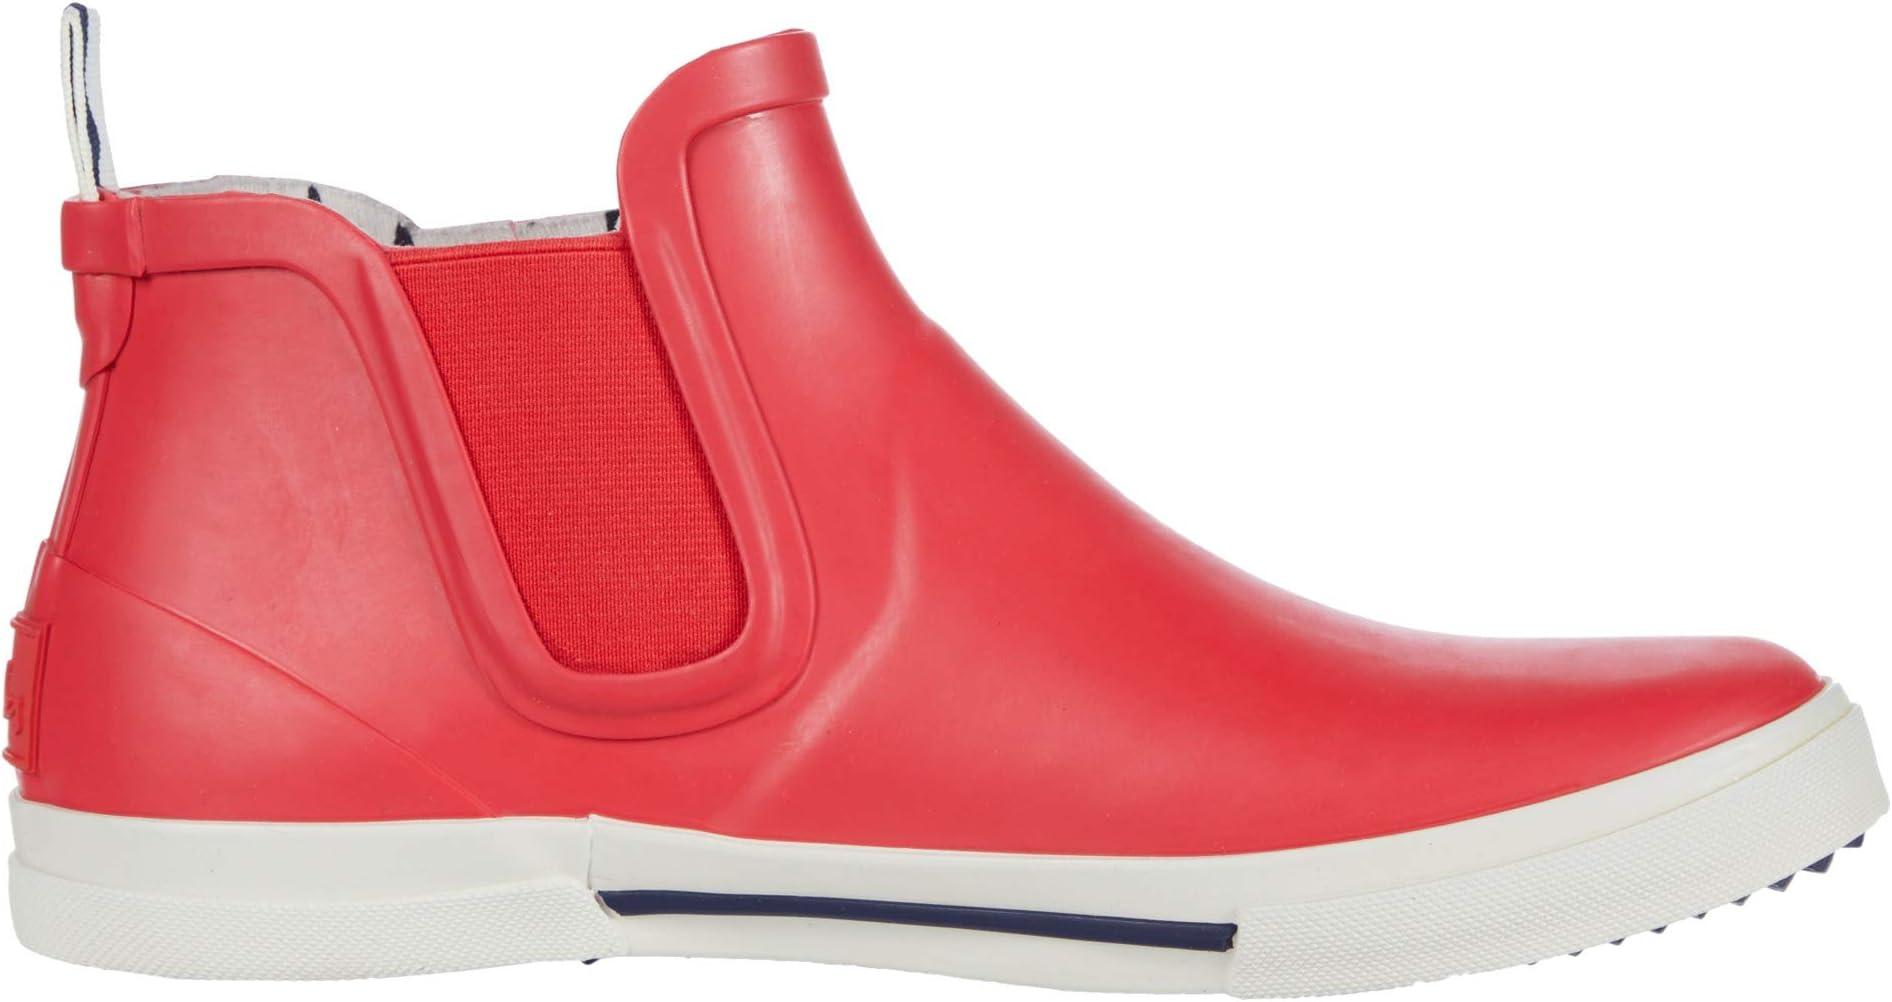 Joules Rainwell | Women's shoes | 2020 Newest